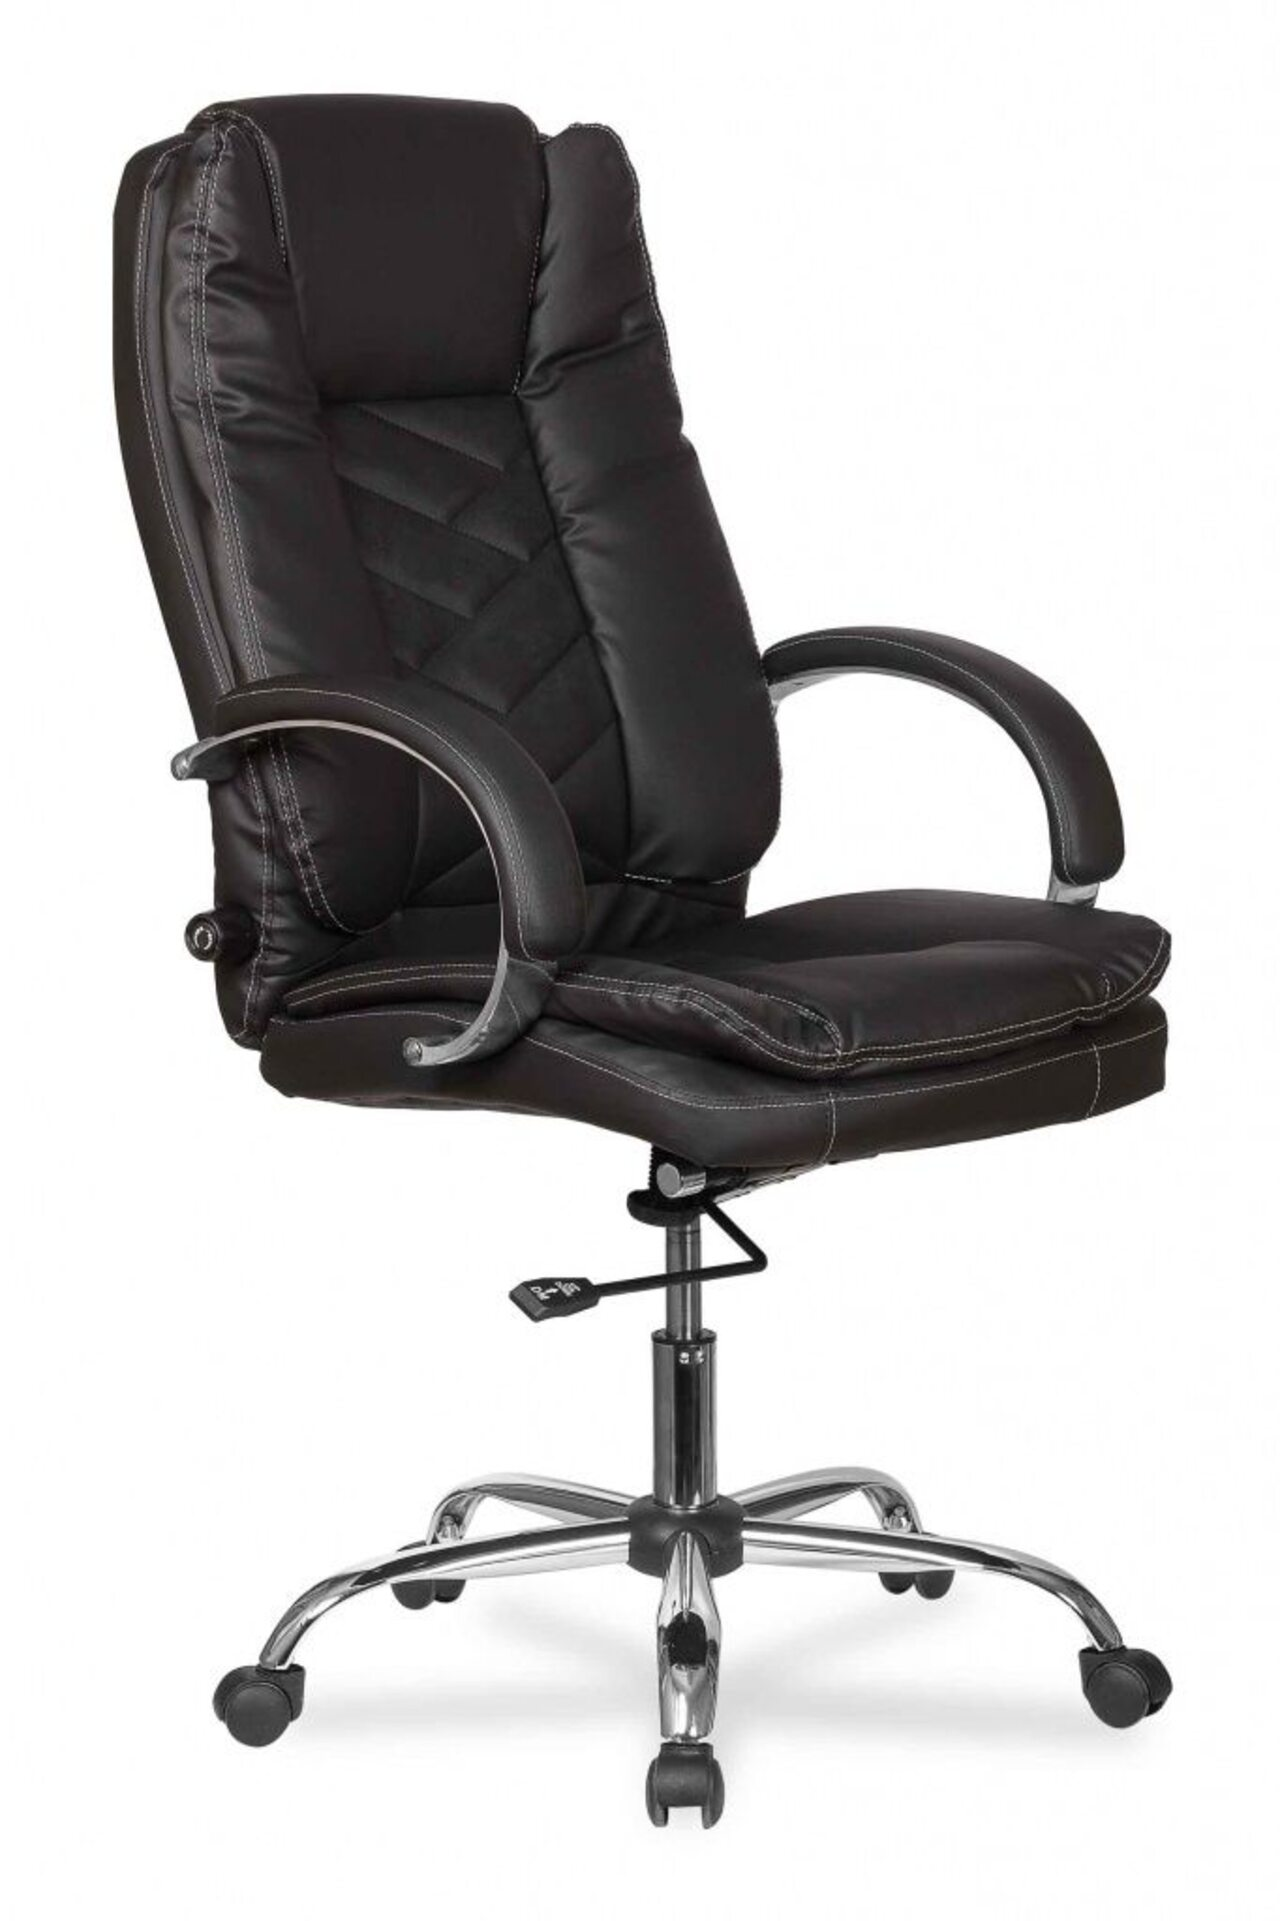 Кресло руководителя College BX-3295 - фото 1